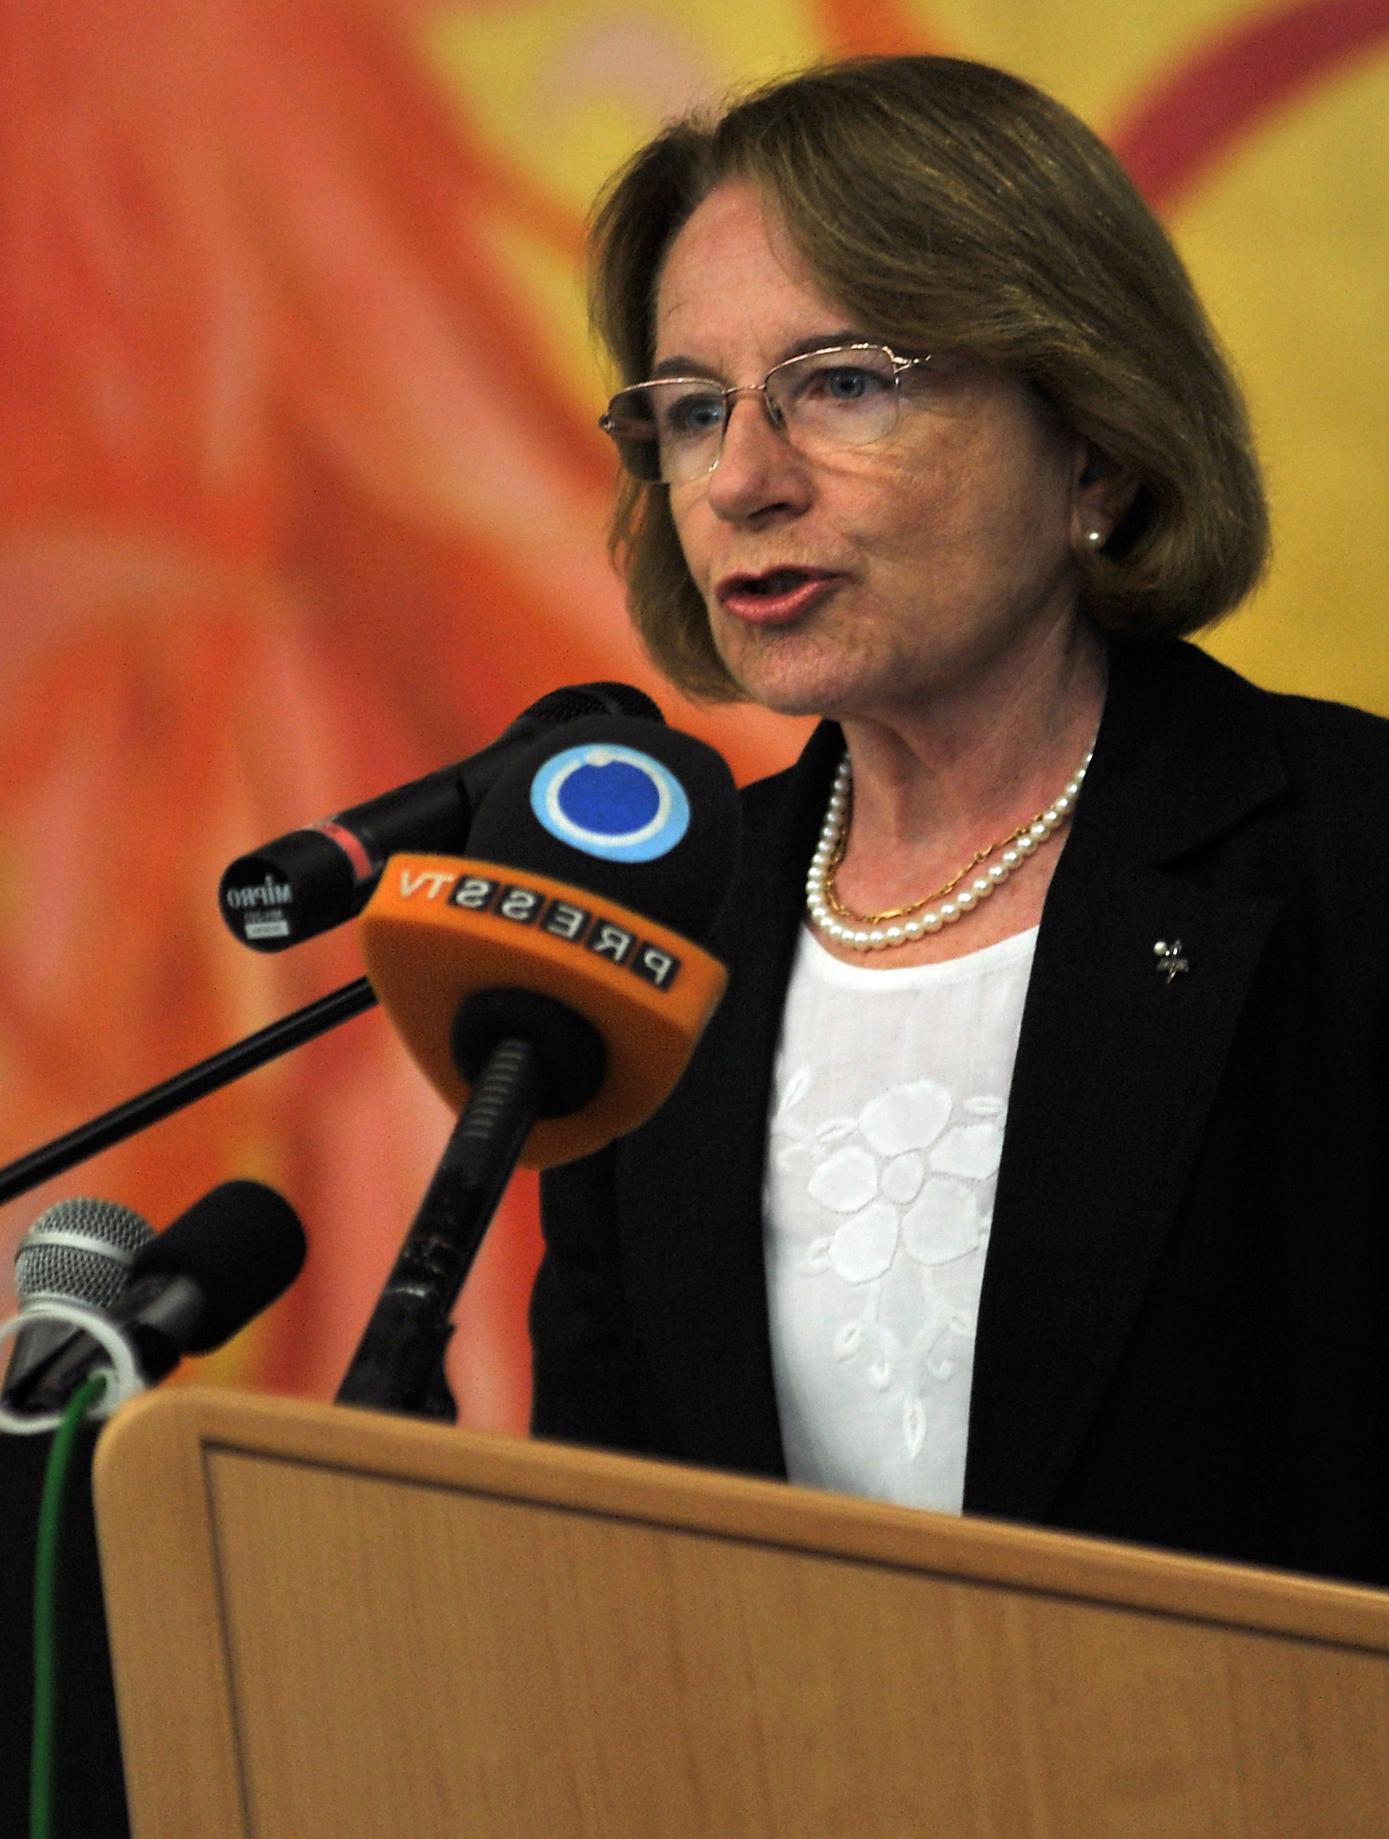 Ana María Cetto at [[IAEA]] Commemorative Ceremony on the [[Atomic bombings of Hiroshima and Nagasaki|Destruction of Hiroshima and Nagasaki]], 2010.